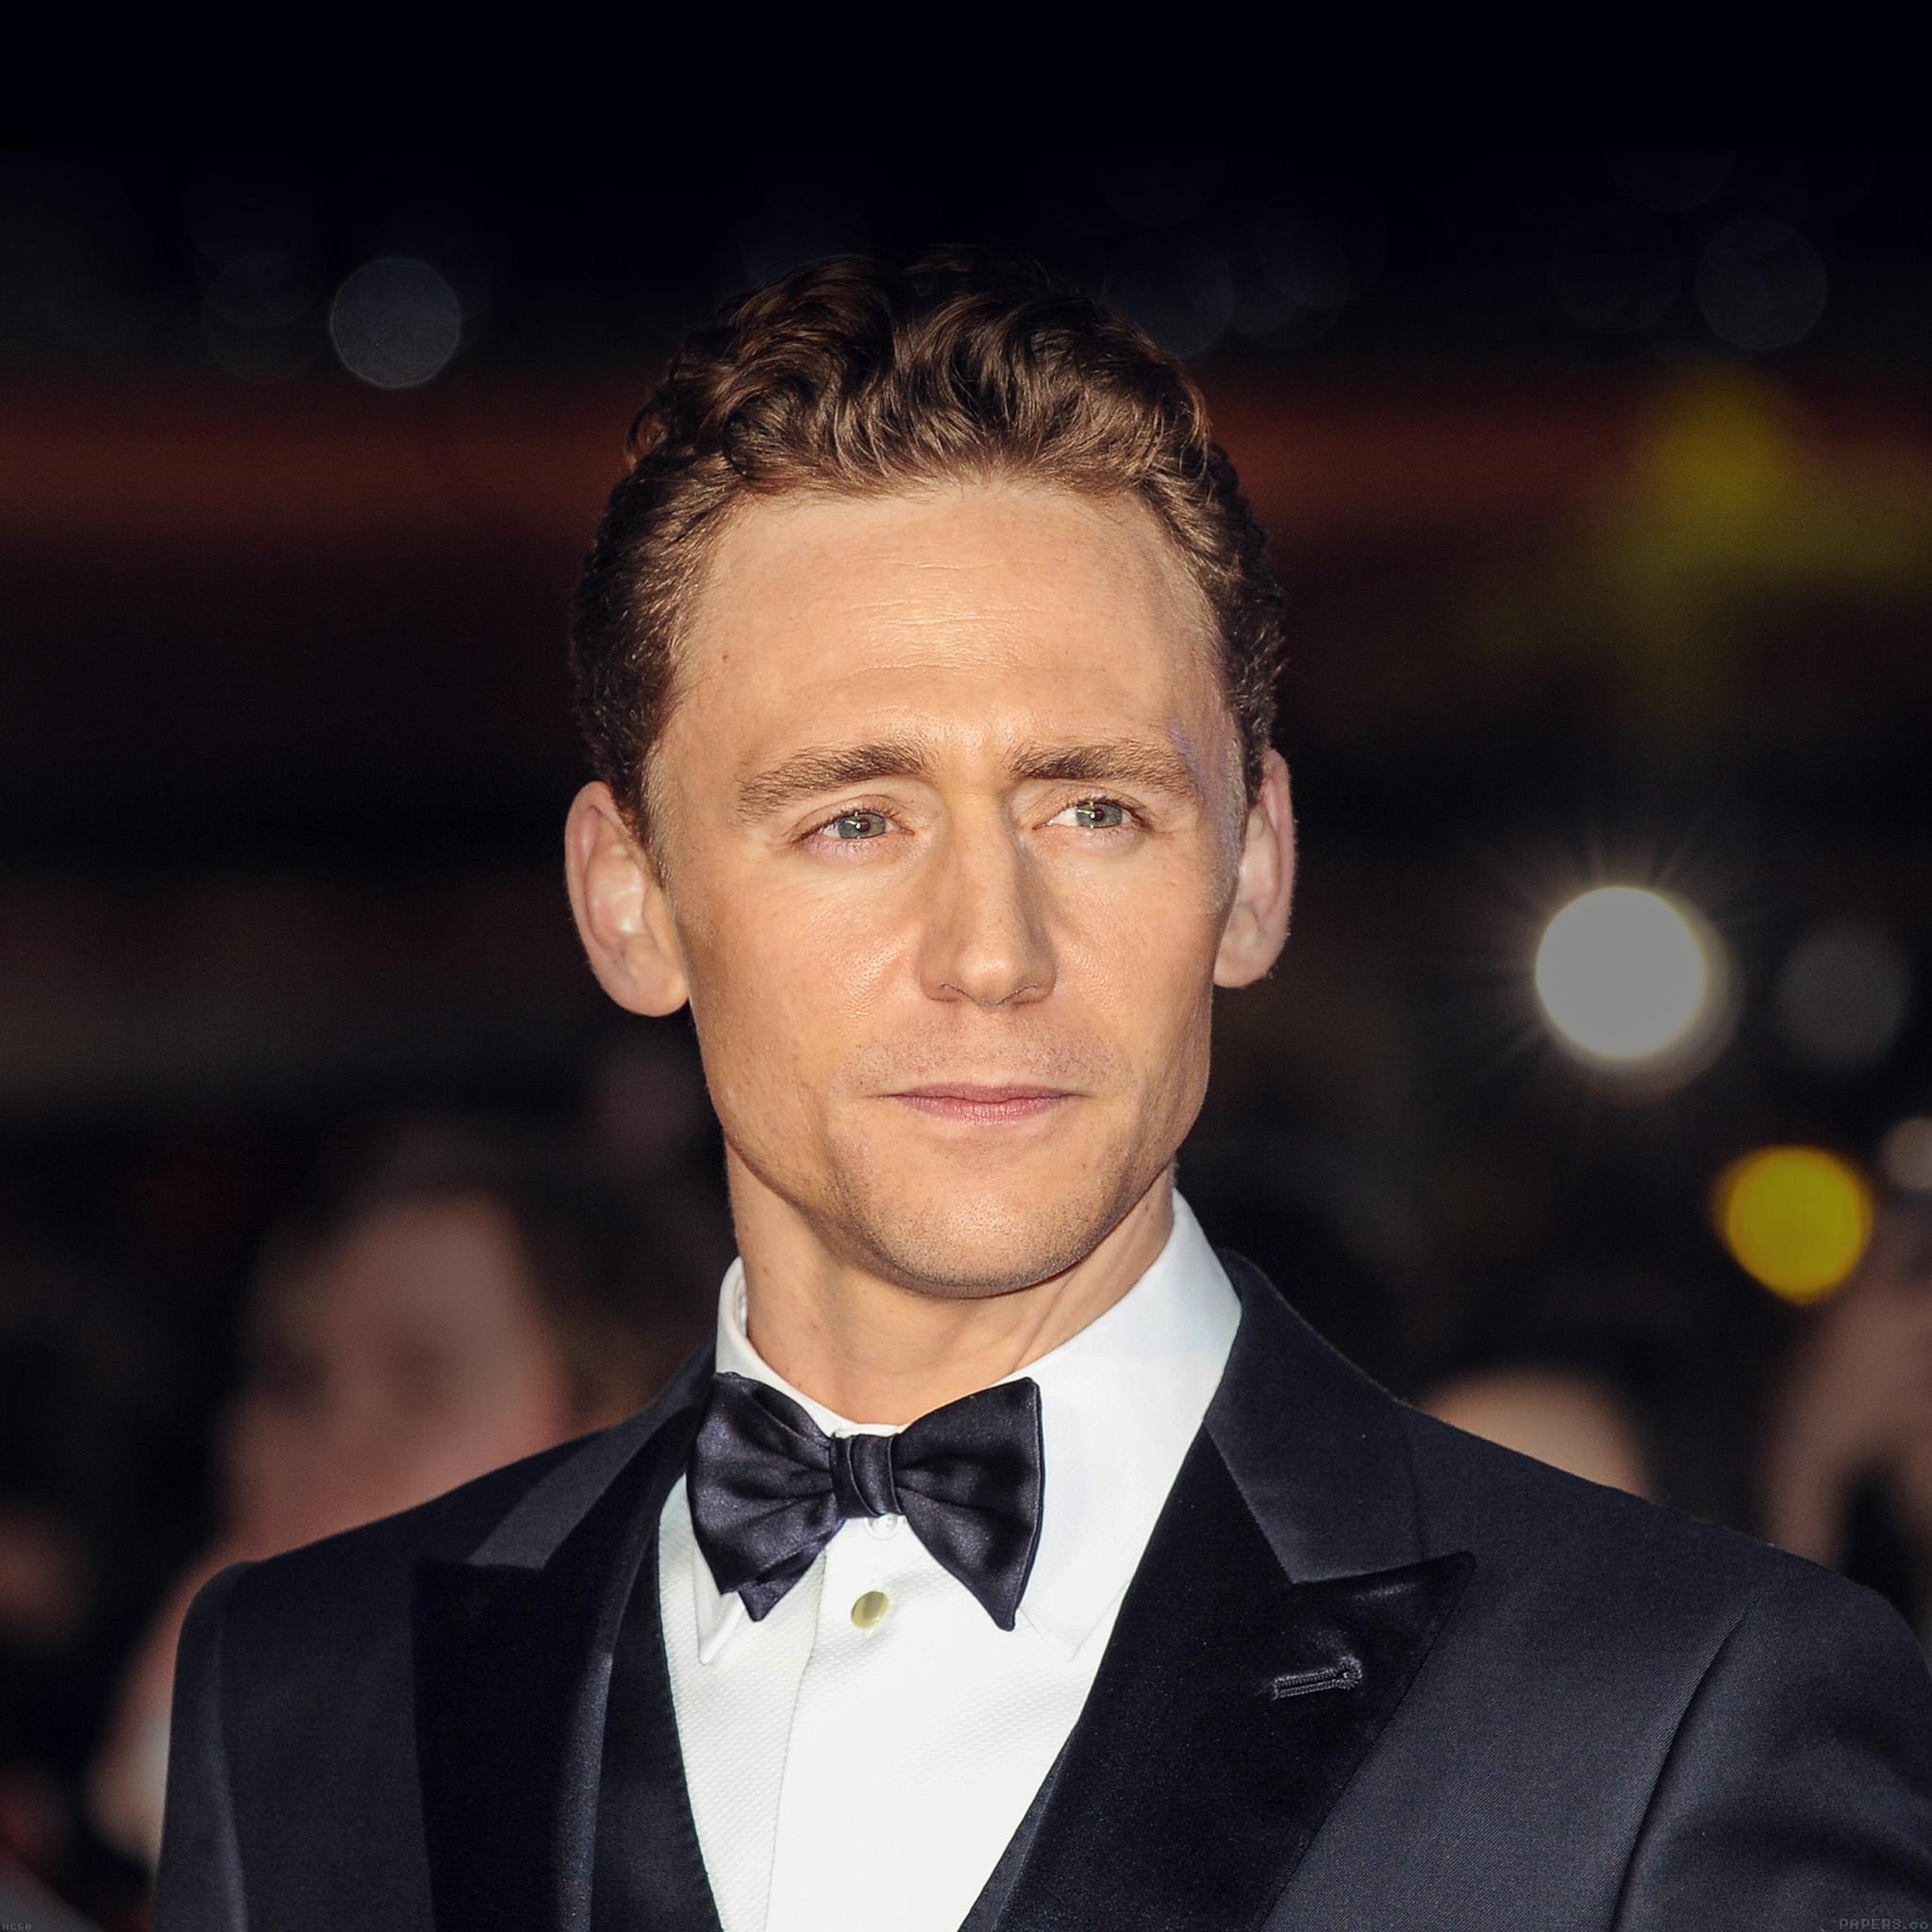 Hc60-tom-hiddlestone-filme-actor-hollywood